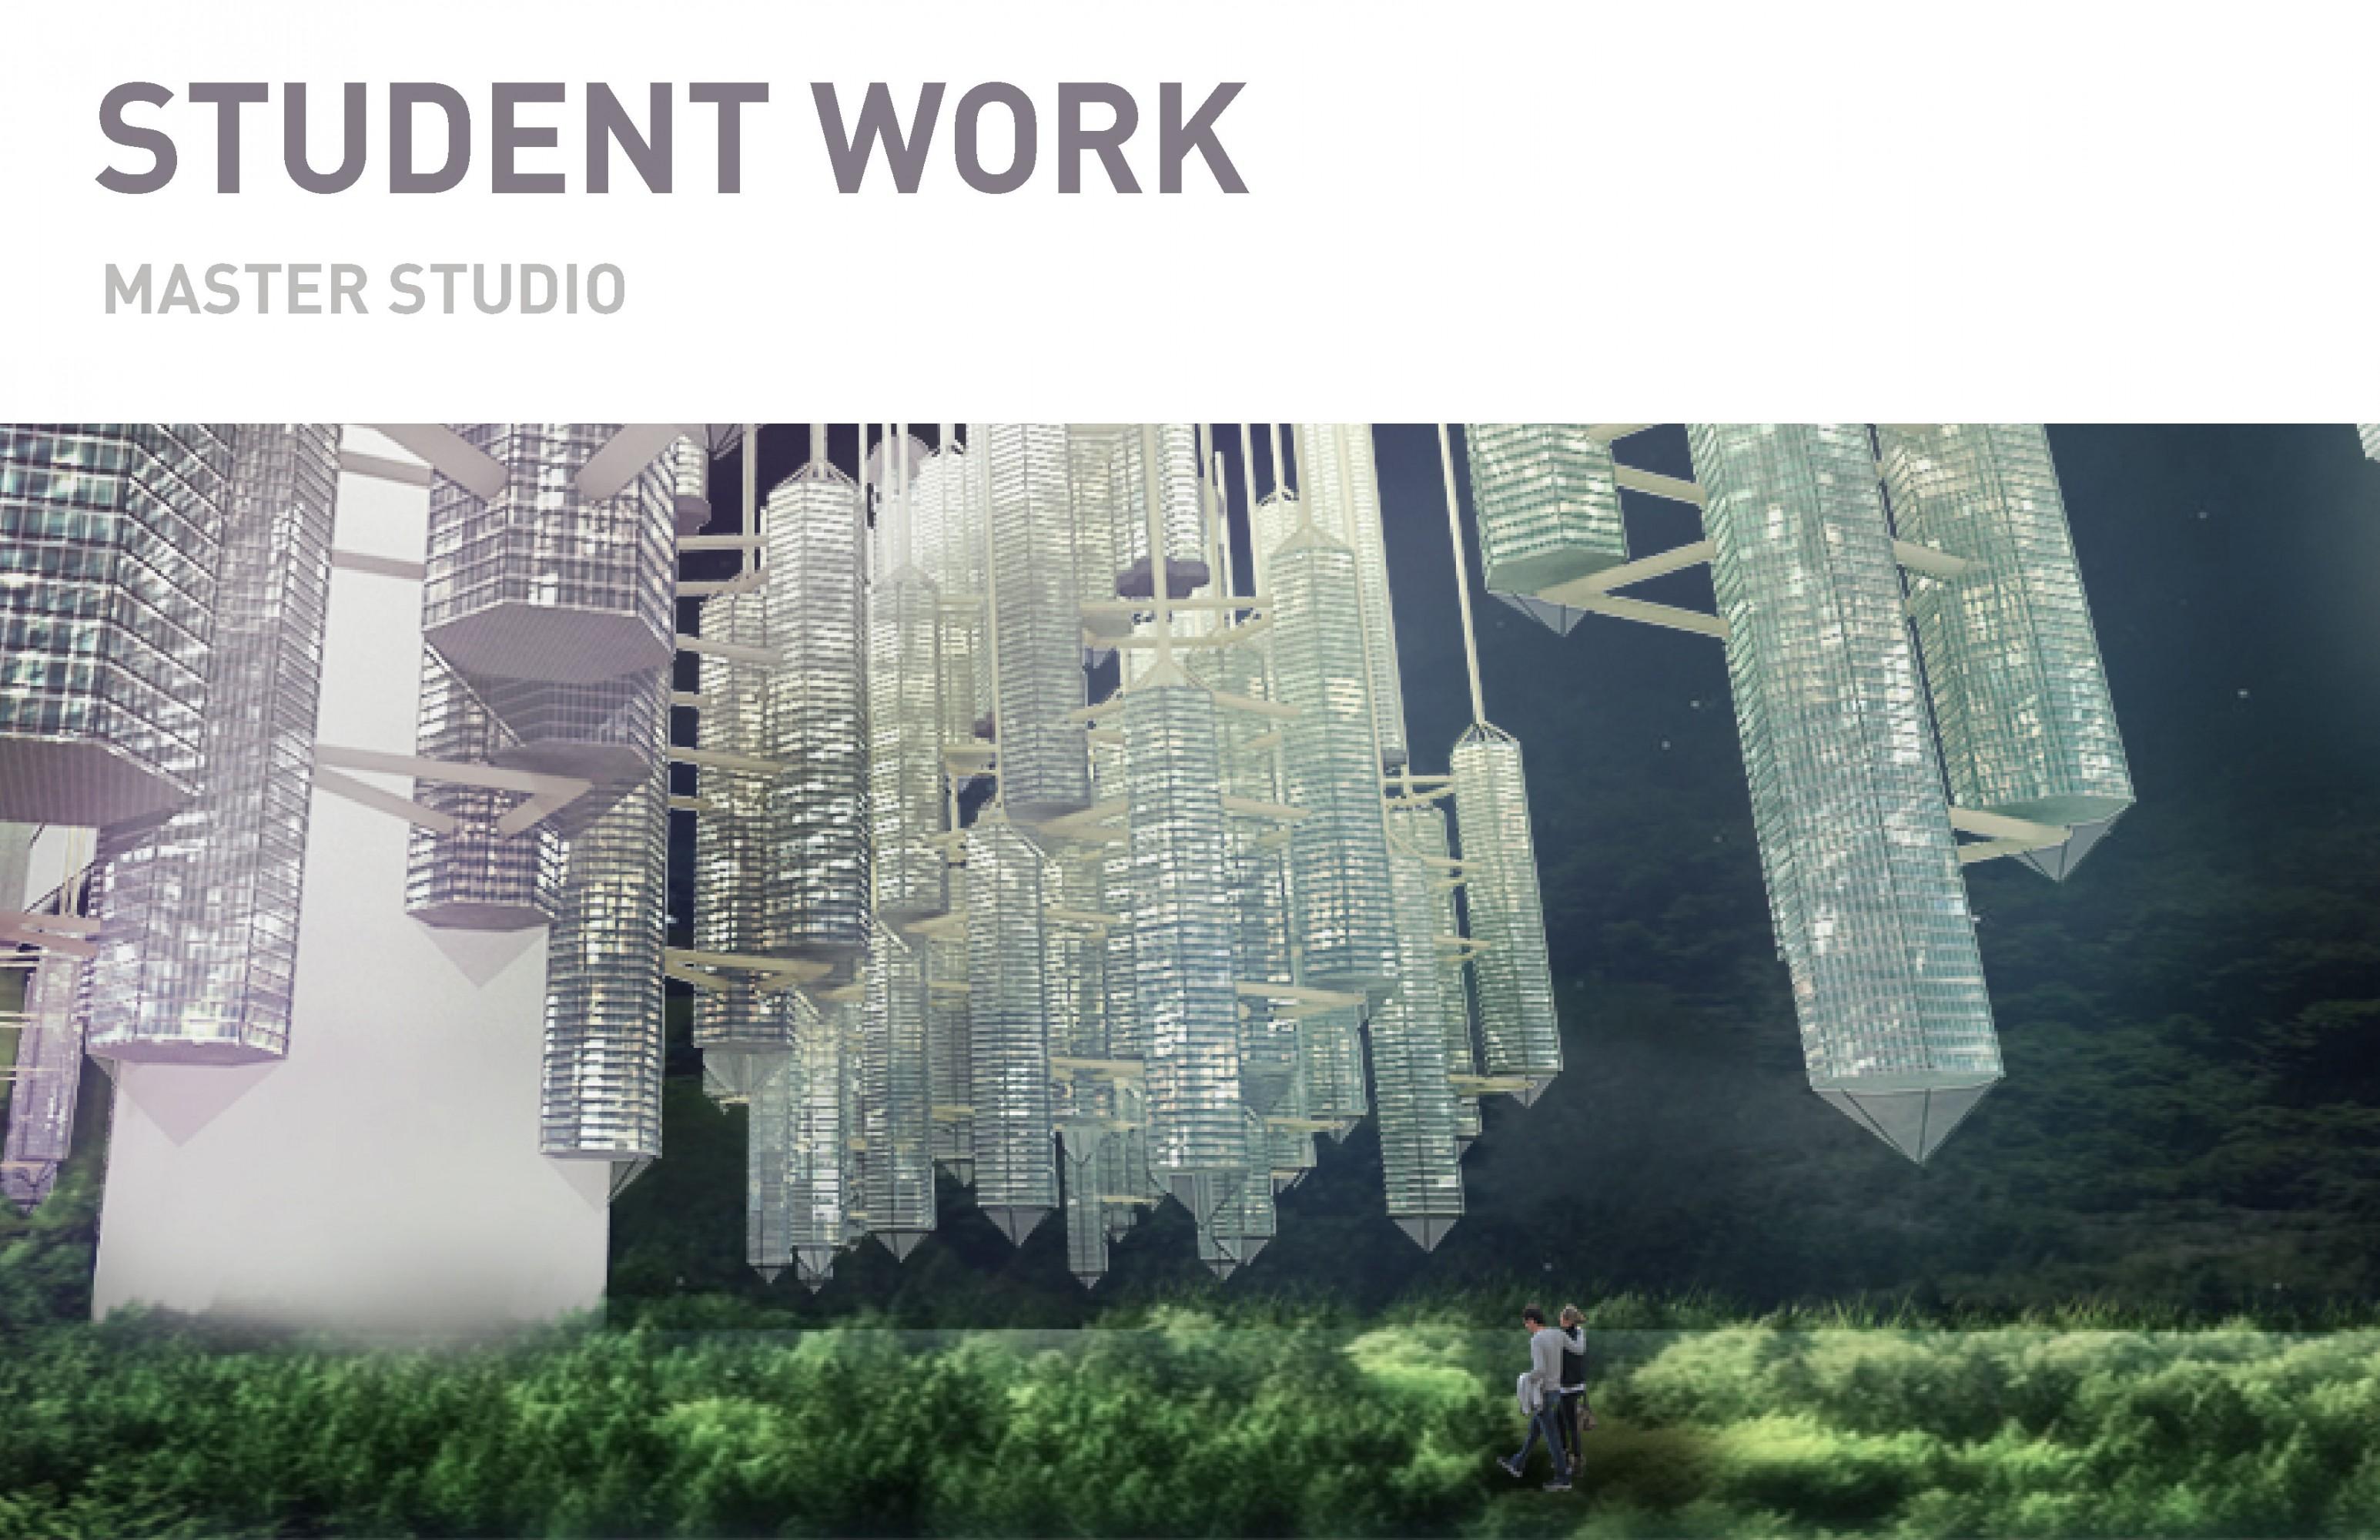 STUDENT WORK / Master Studio